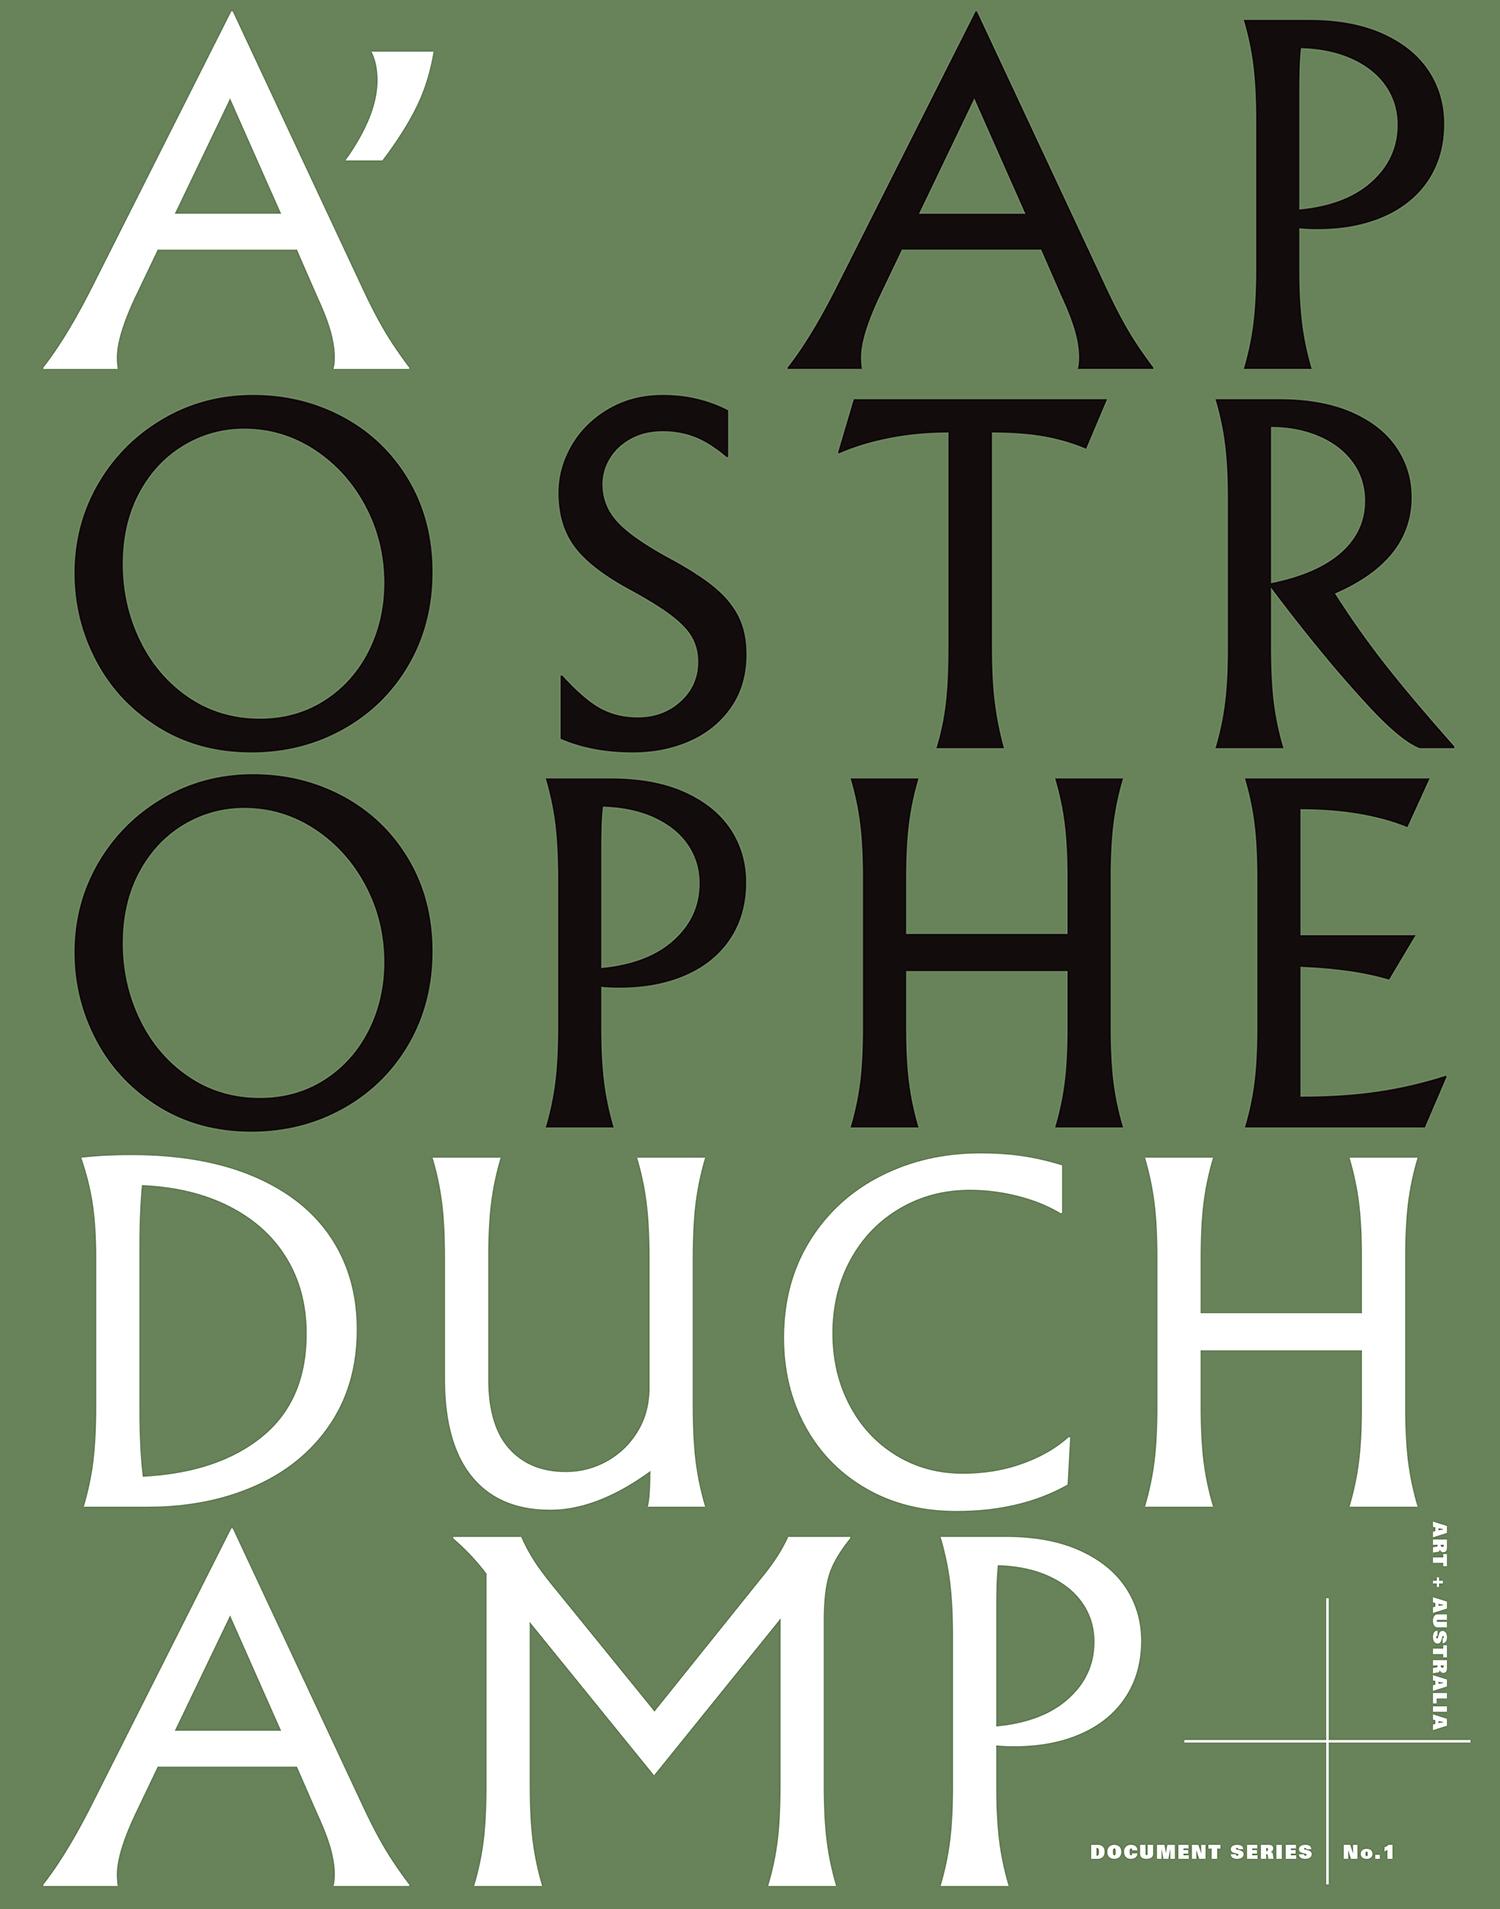 apostrophe duchamp